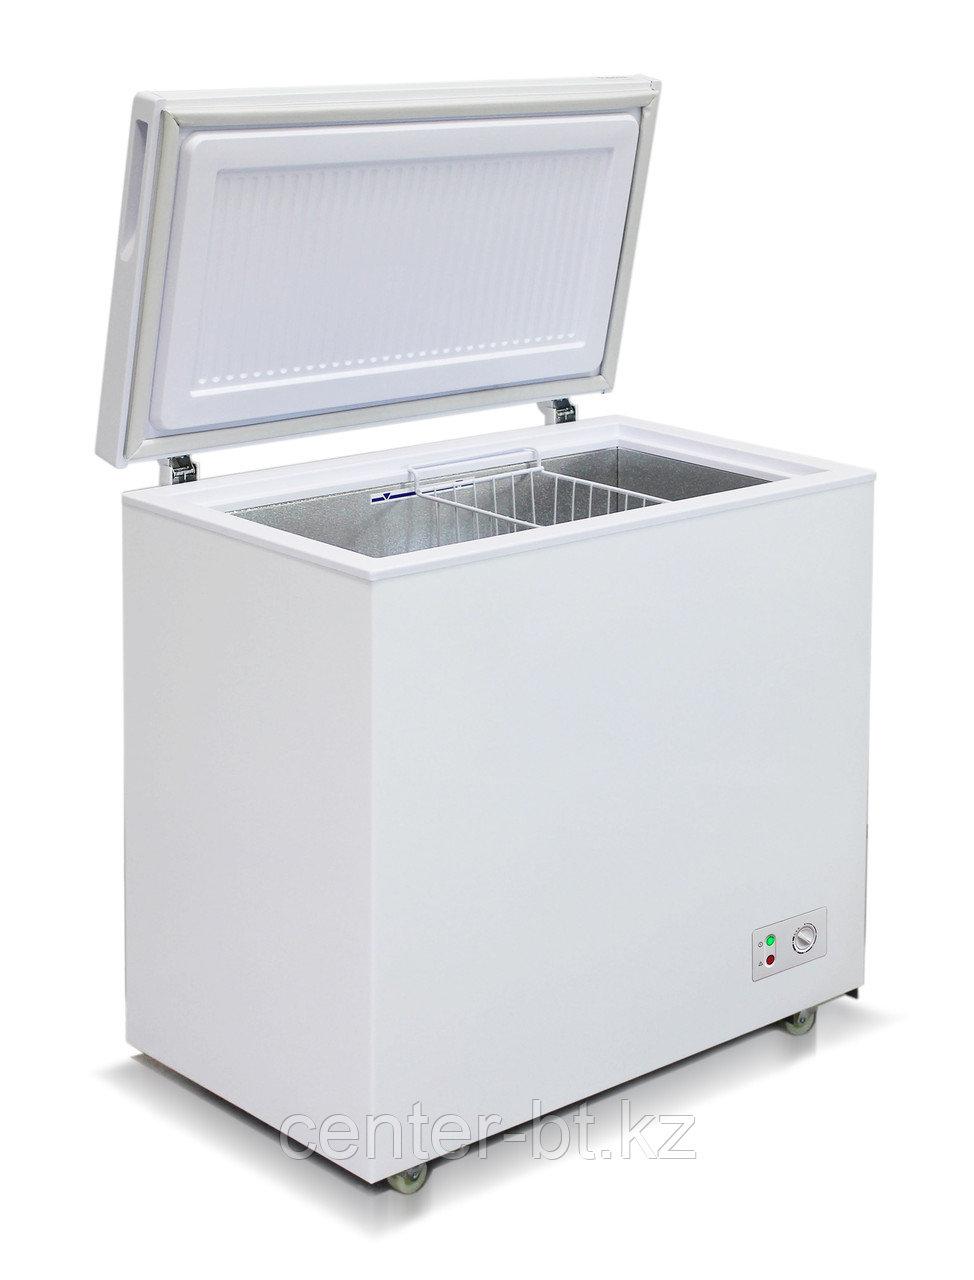 Морозильная камера ларь Бирюса-210KX